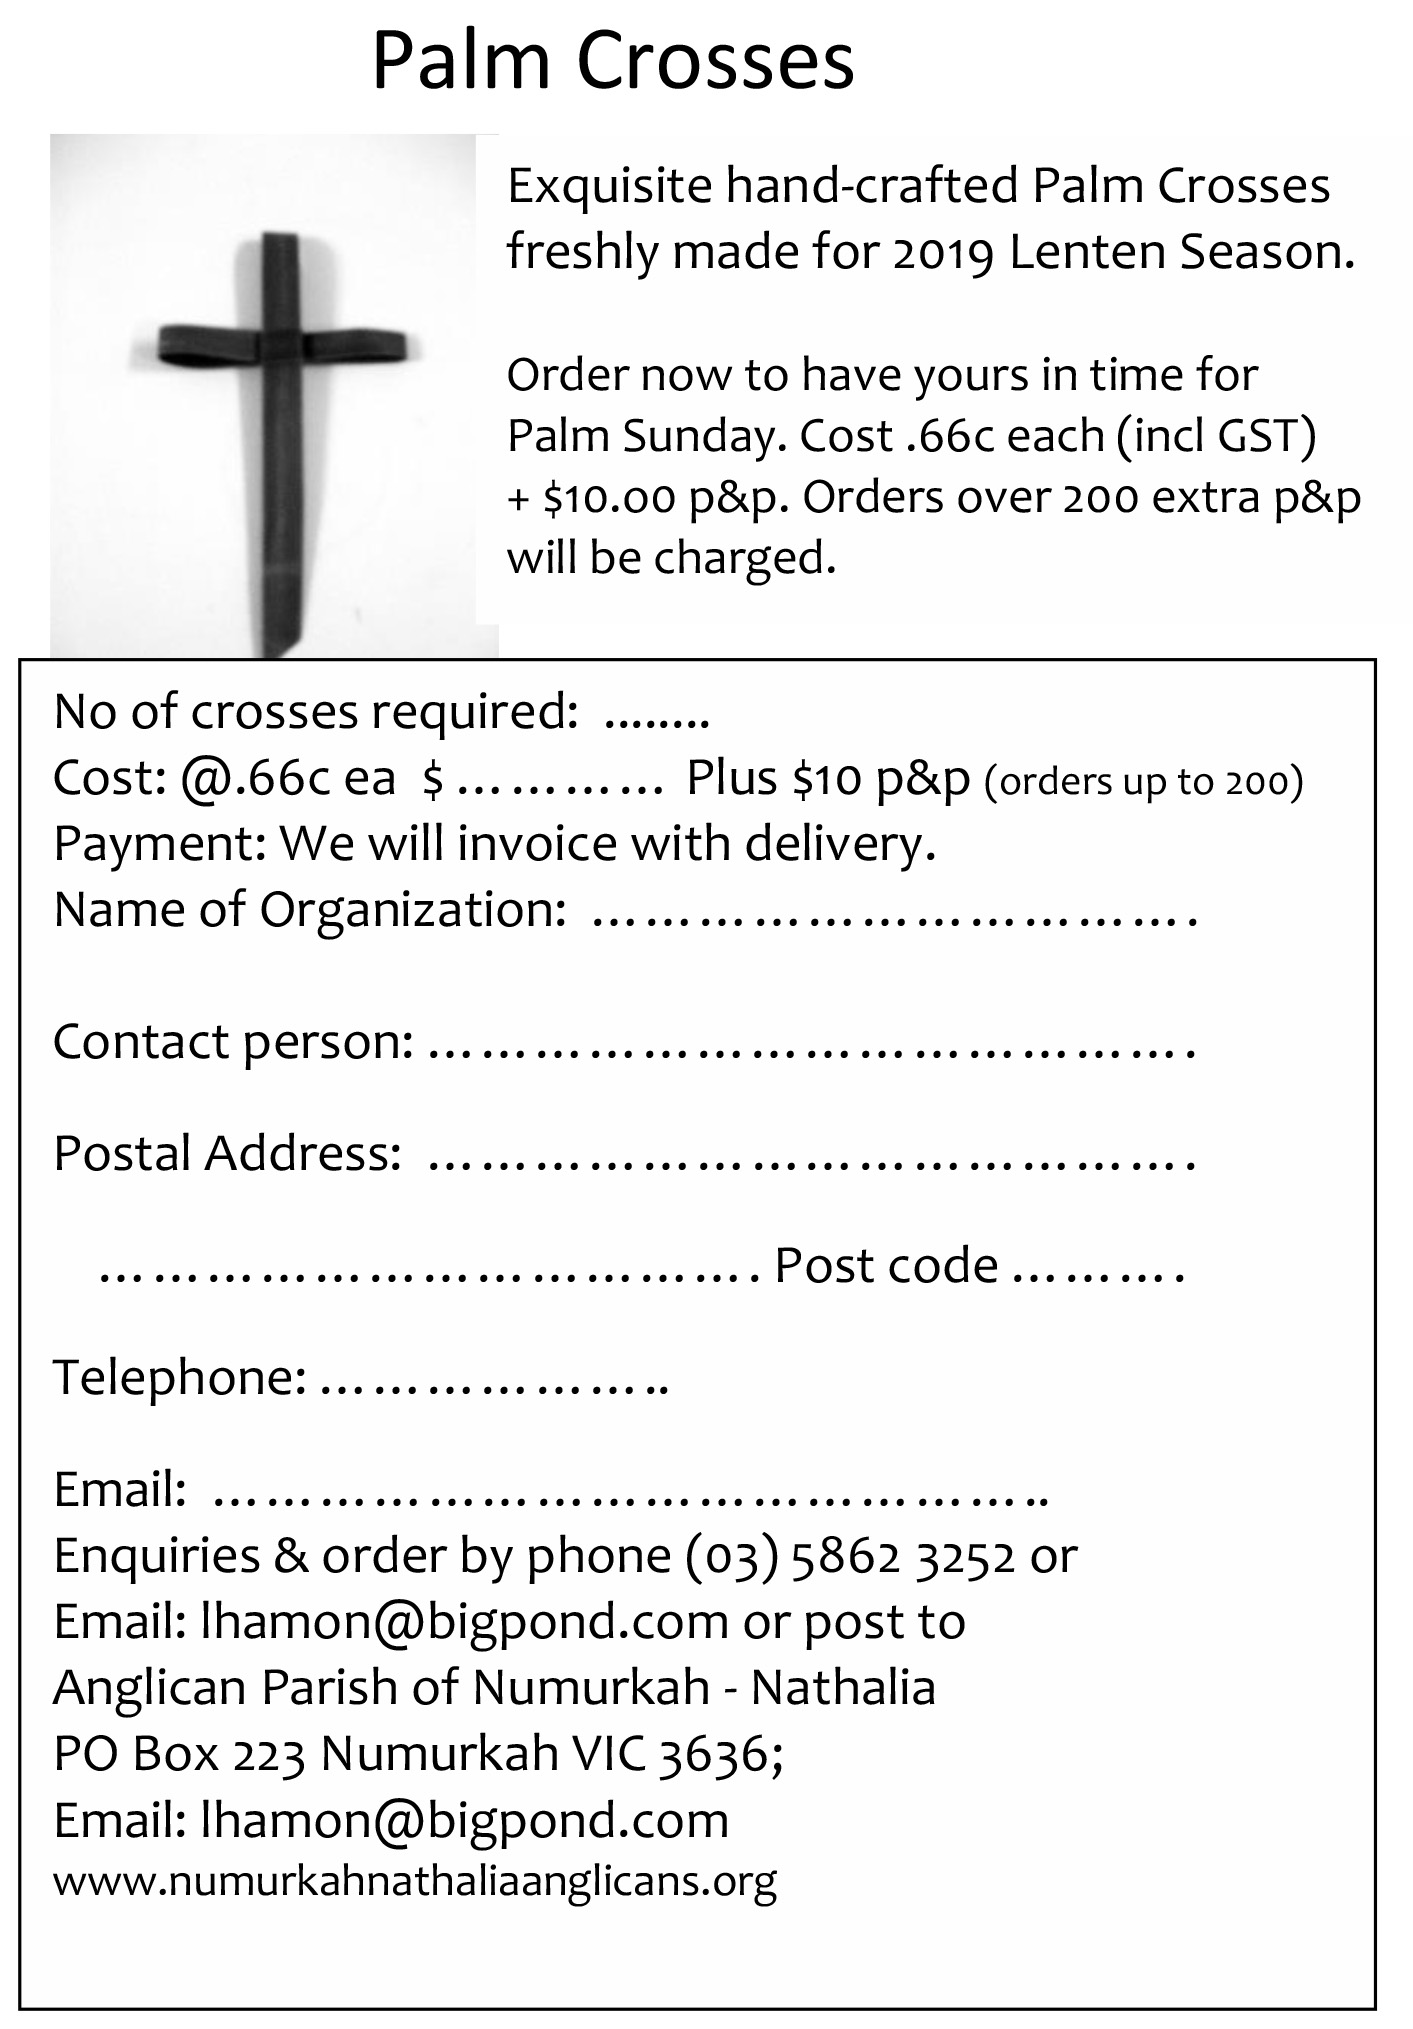 Anglican Parish of Numurkah-Nathalia | Diocese of Wangaratta